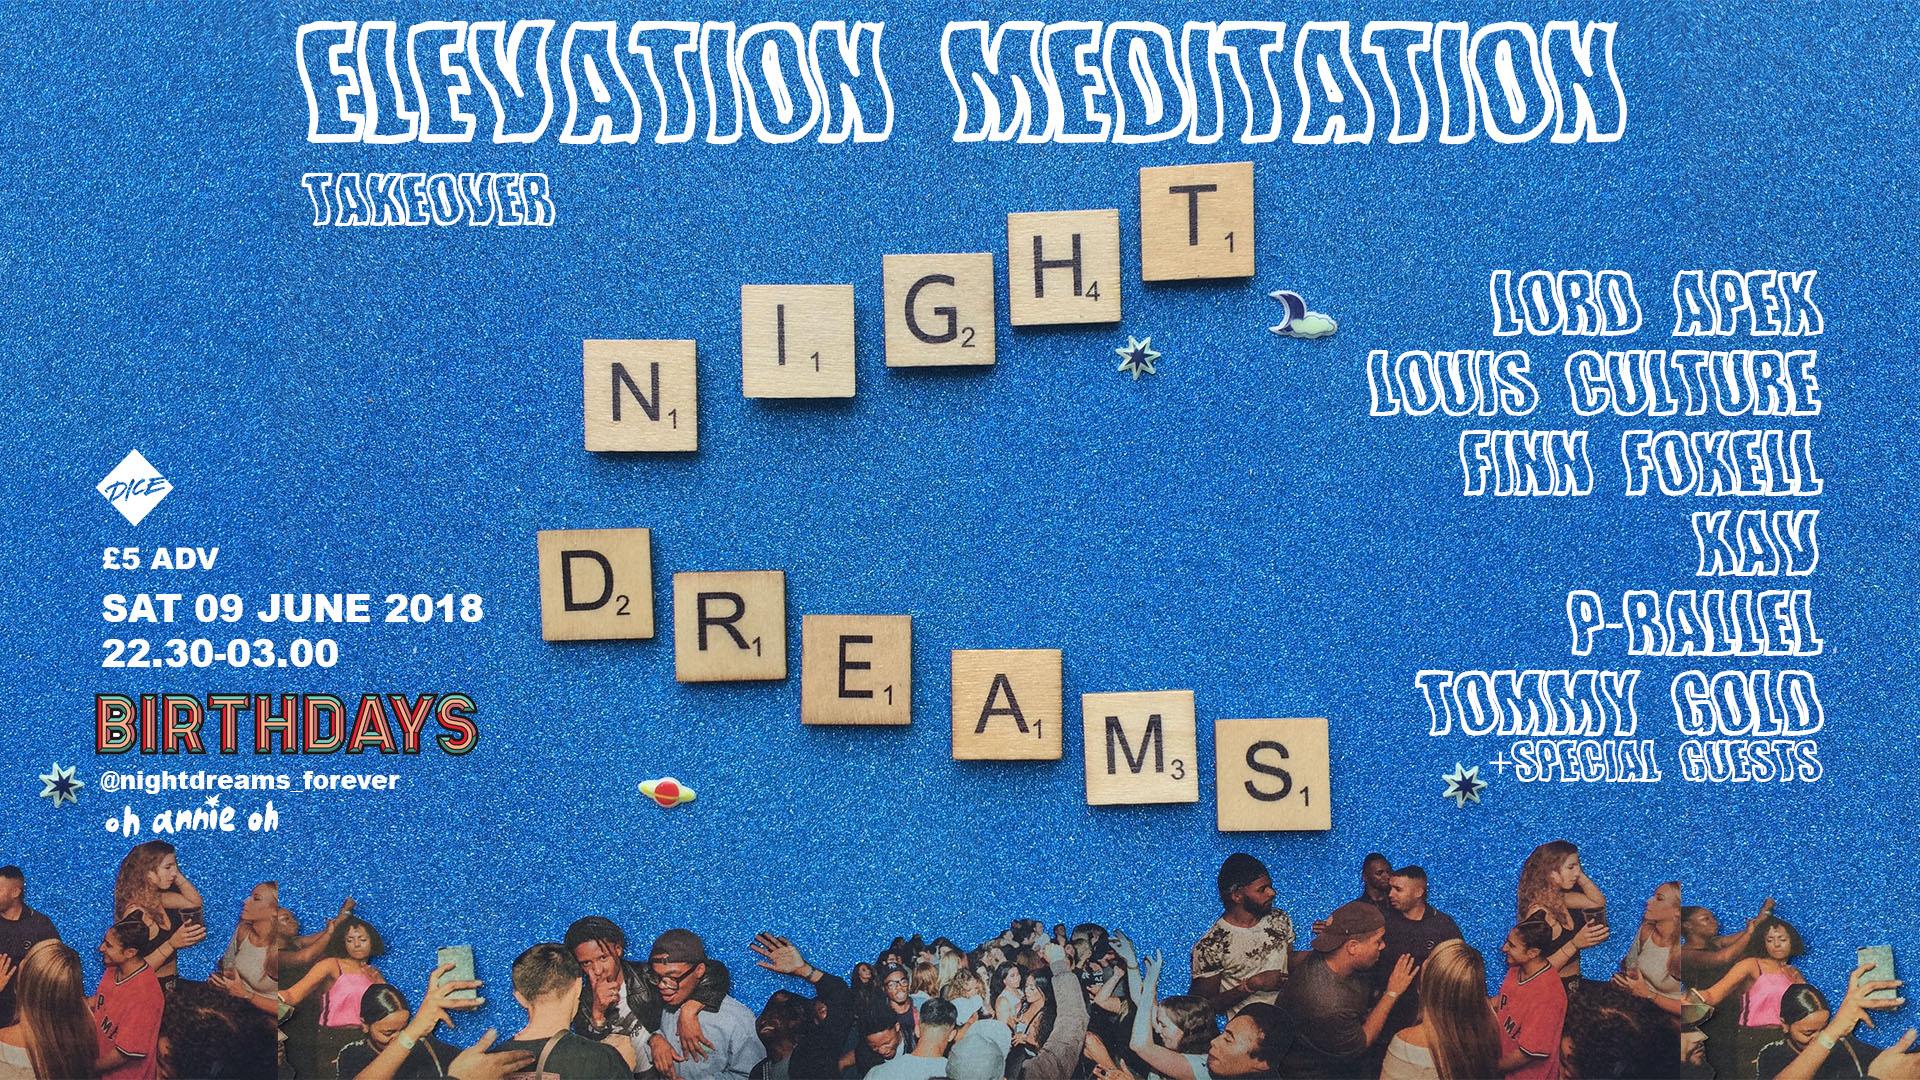 NIGHT DREAMS 23 - 09 JUNE - LANDSCAPE.jpg